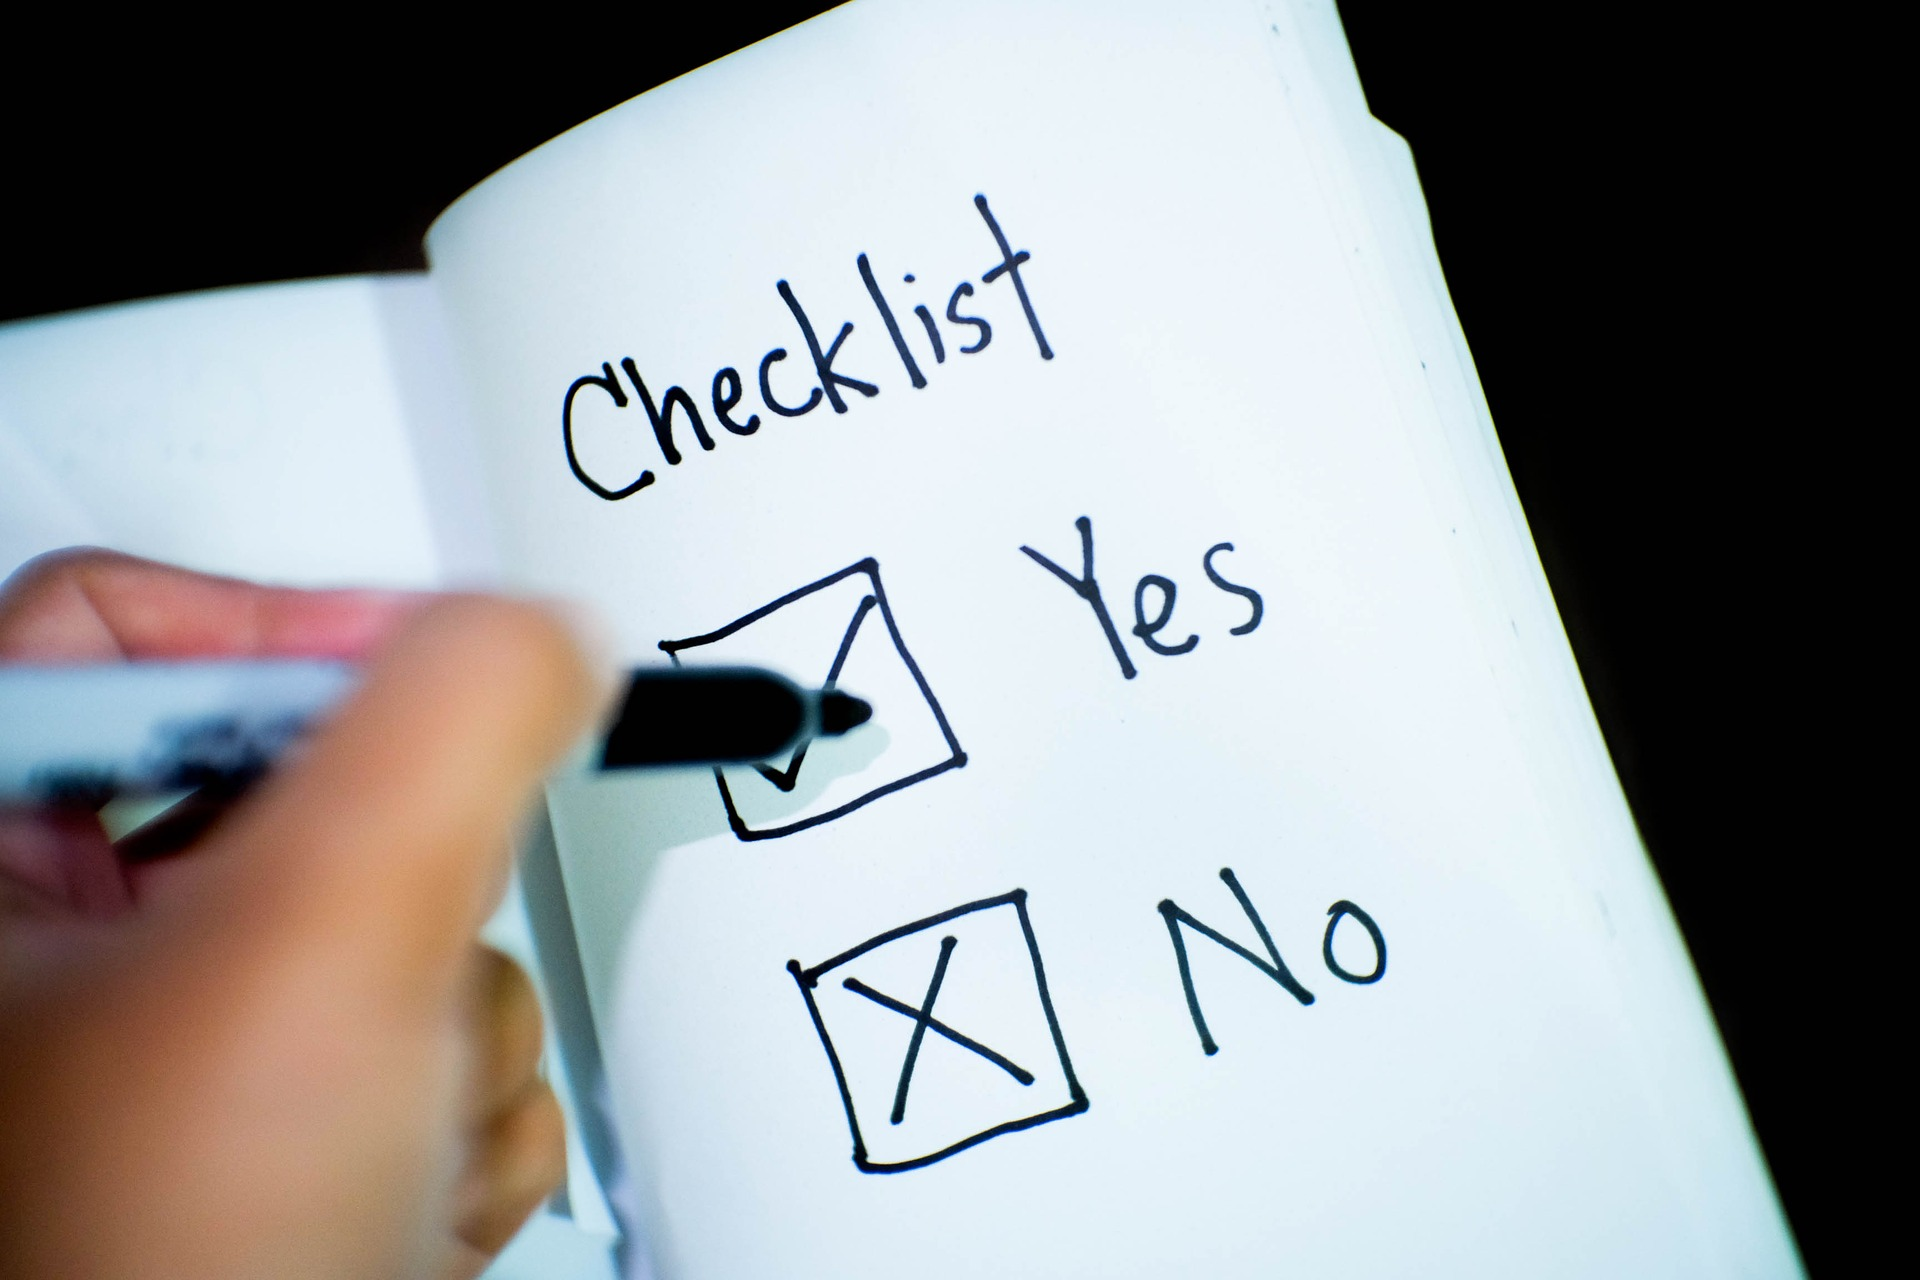 checklist-2313804_1920